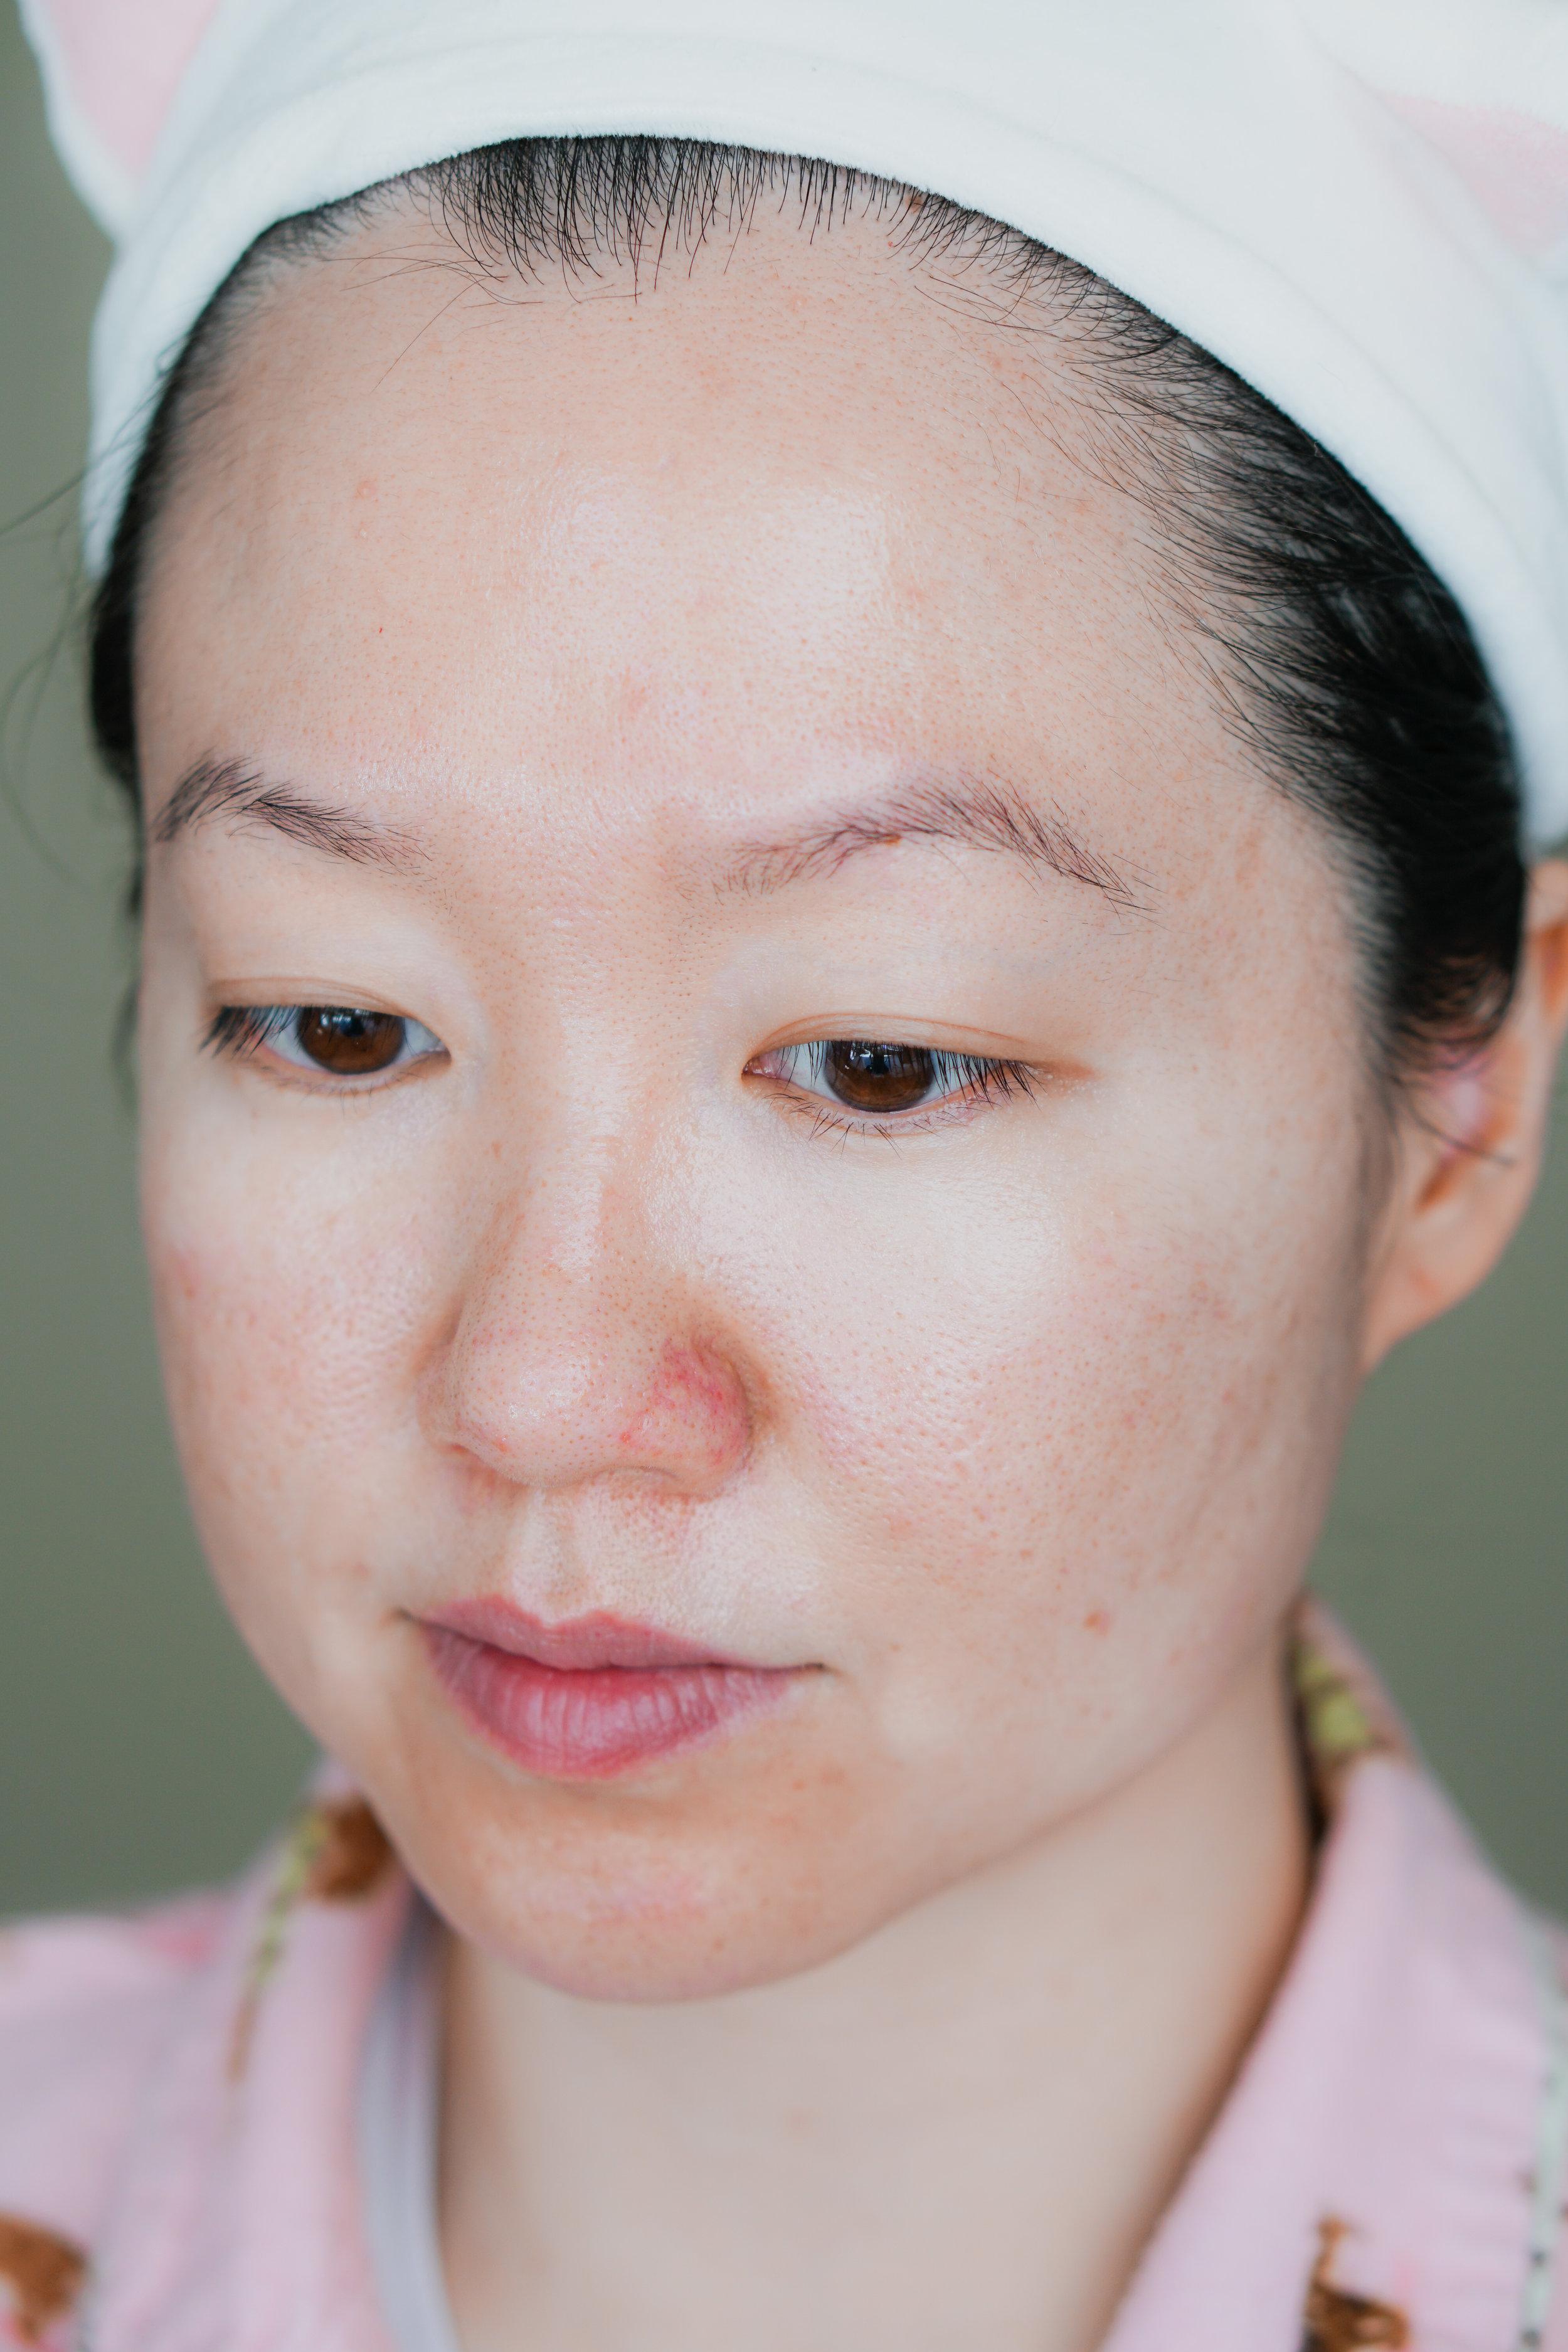 Jayjun AntiDust Whitening Mask Review_DSC07246-2.jpg